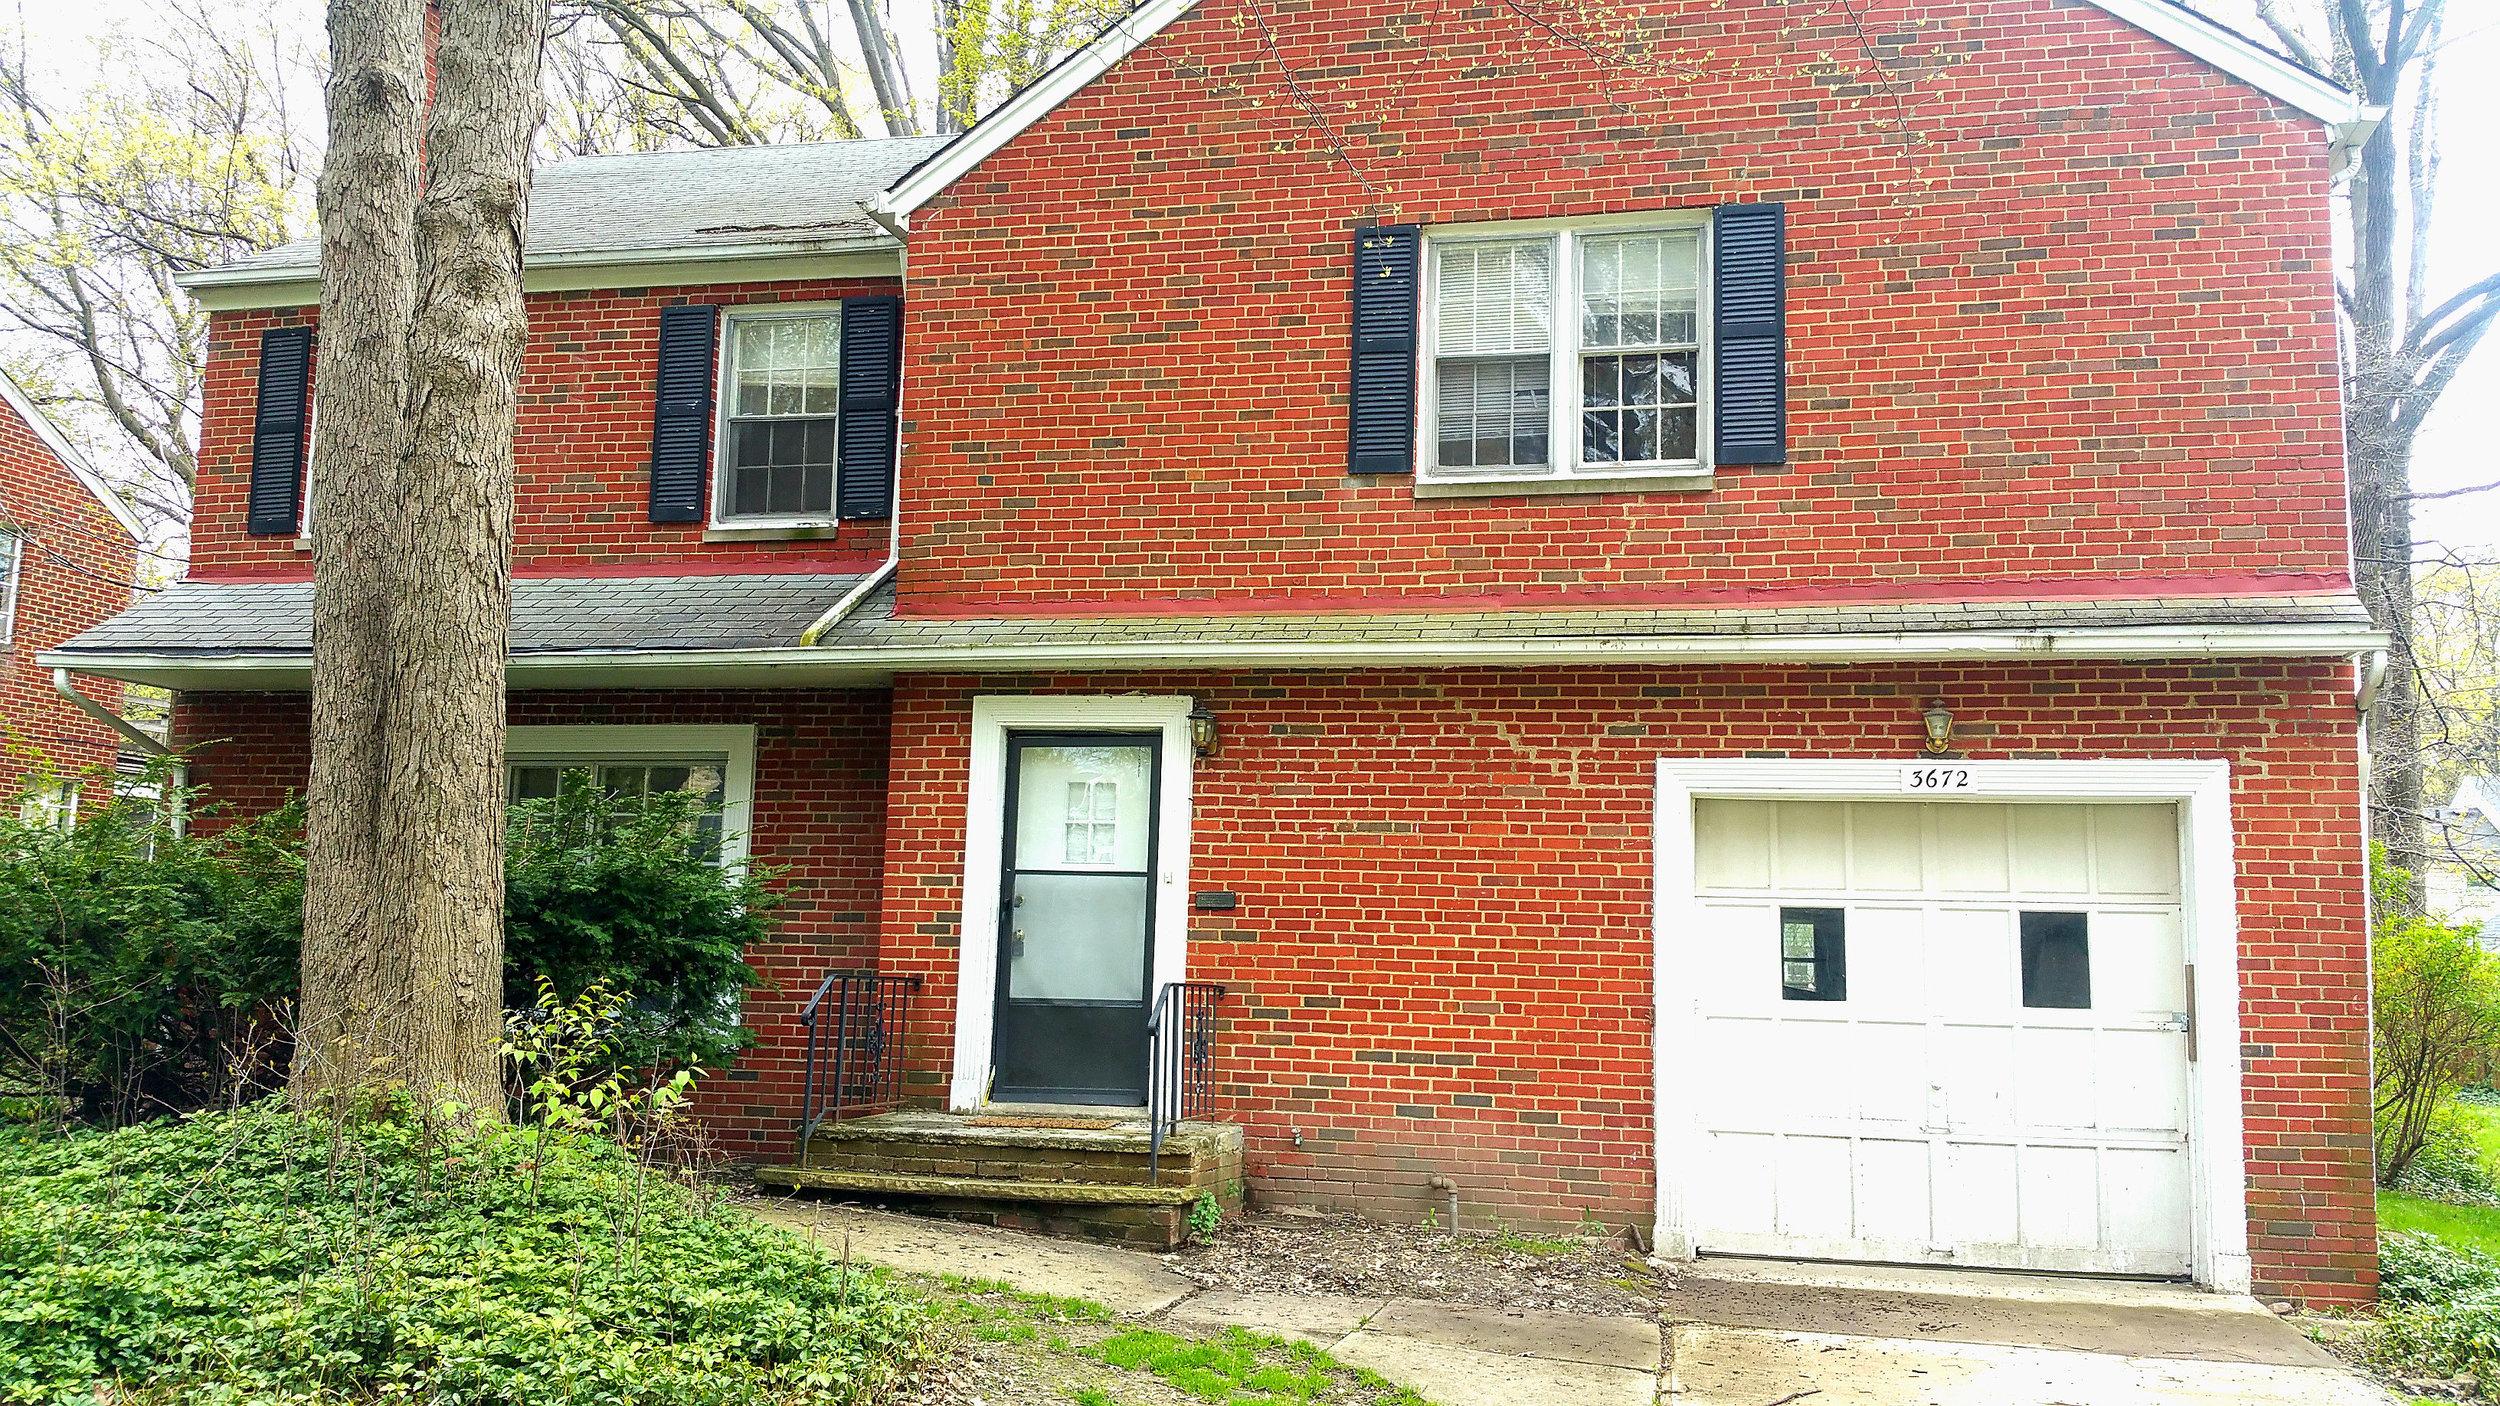 3672 Fenley Rd., Cleveland Hts. | 3 bed 2 bath | 1,967 Sq. Ft. | $79,900